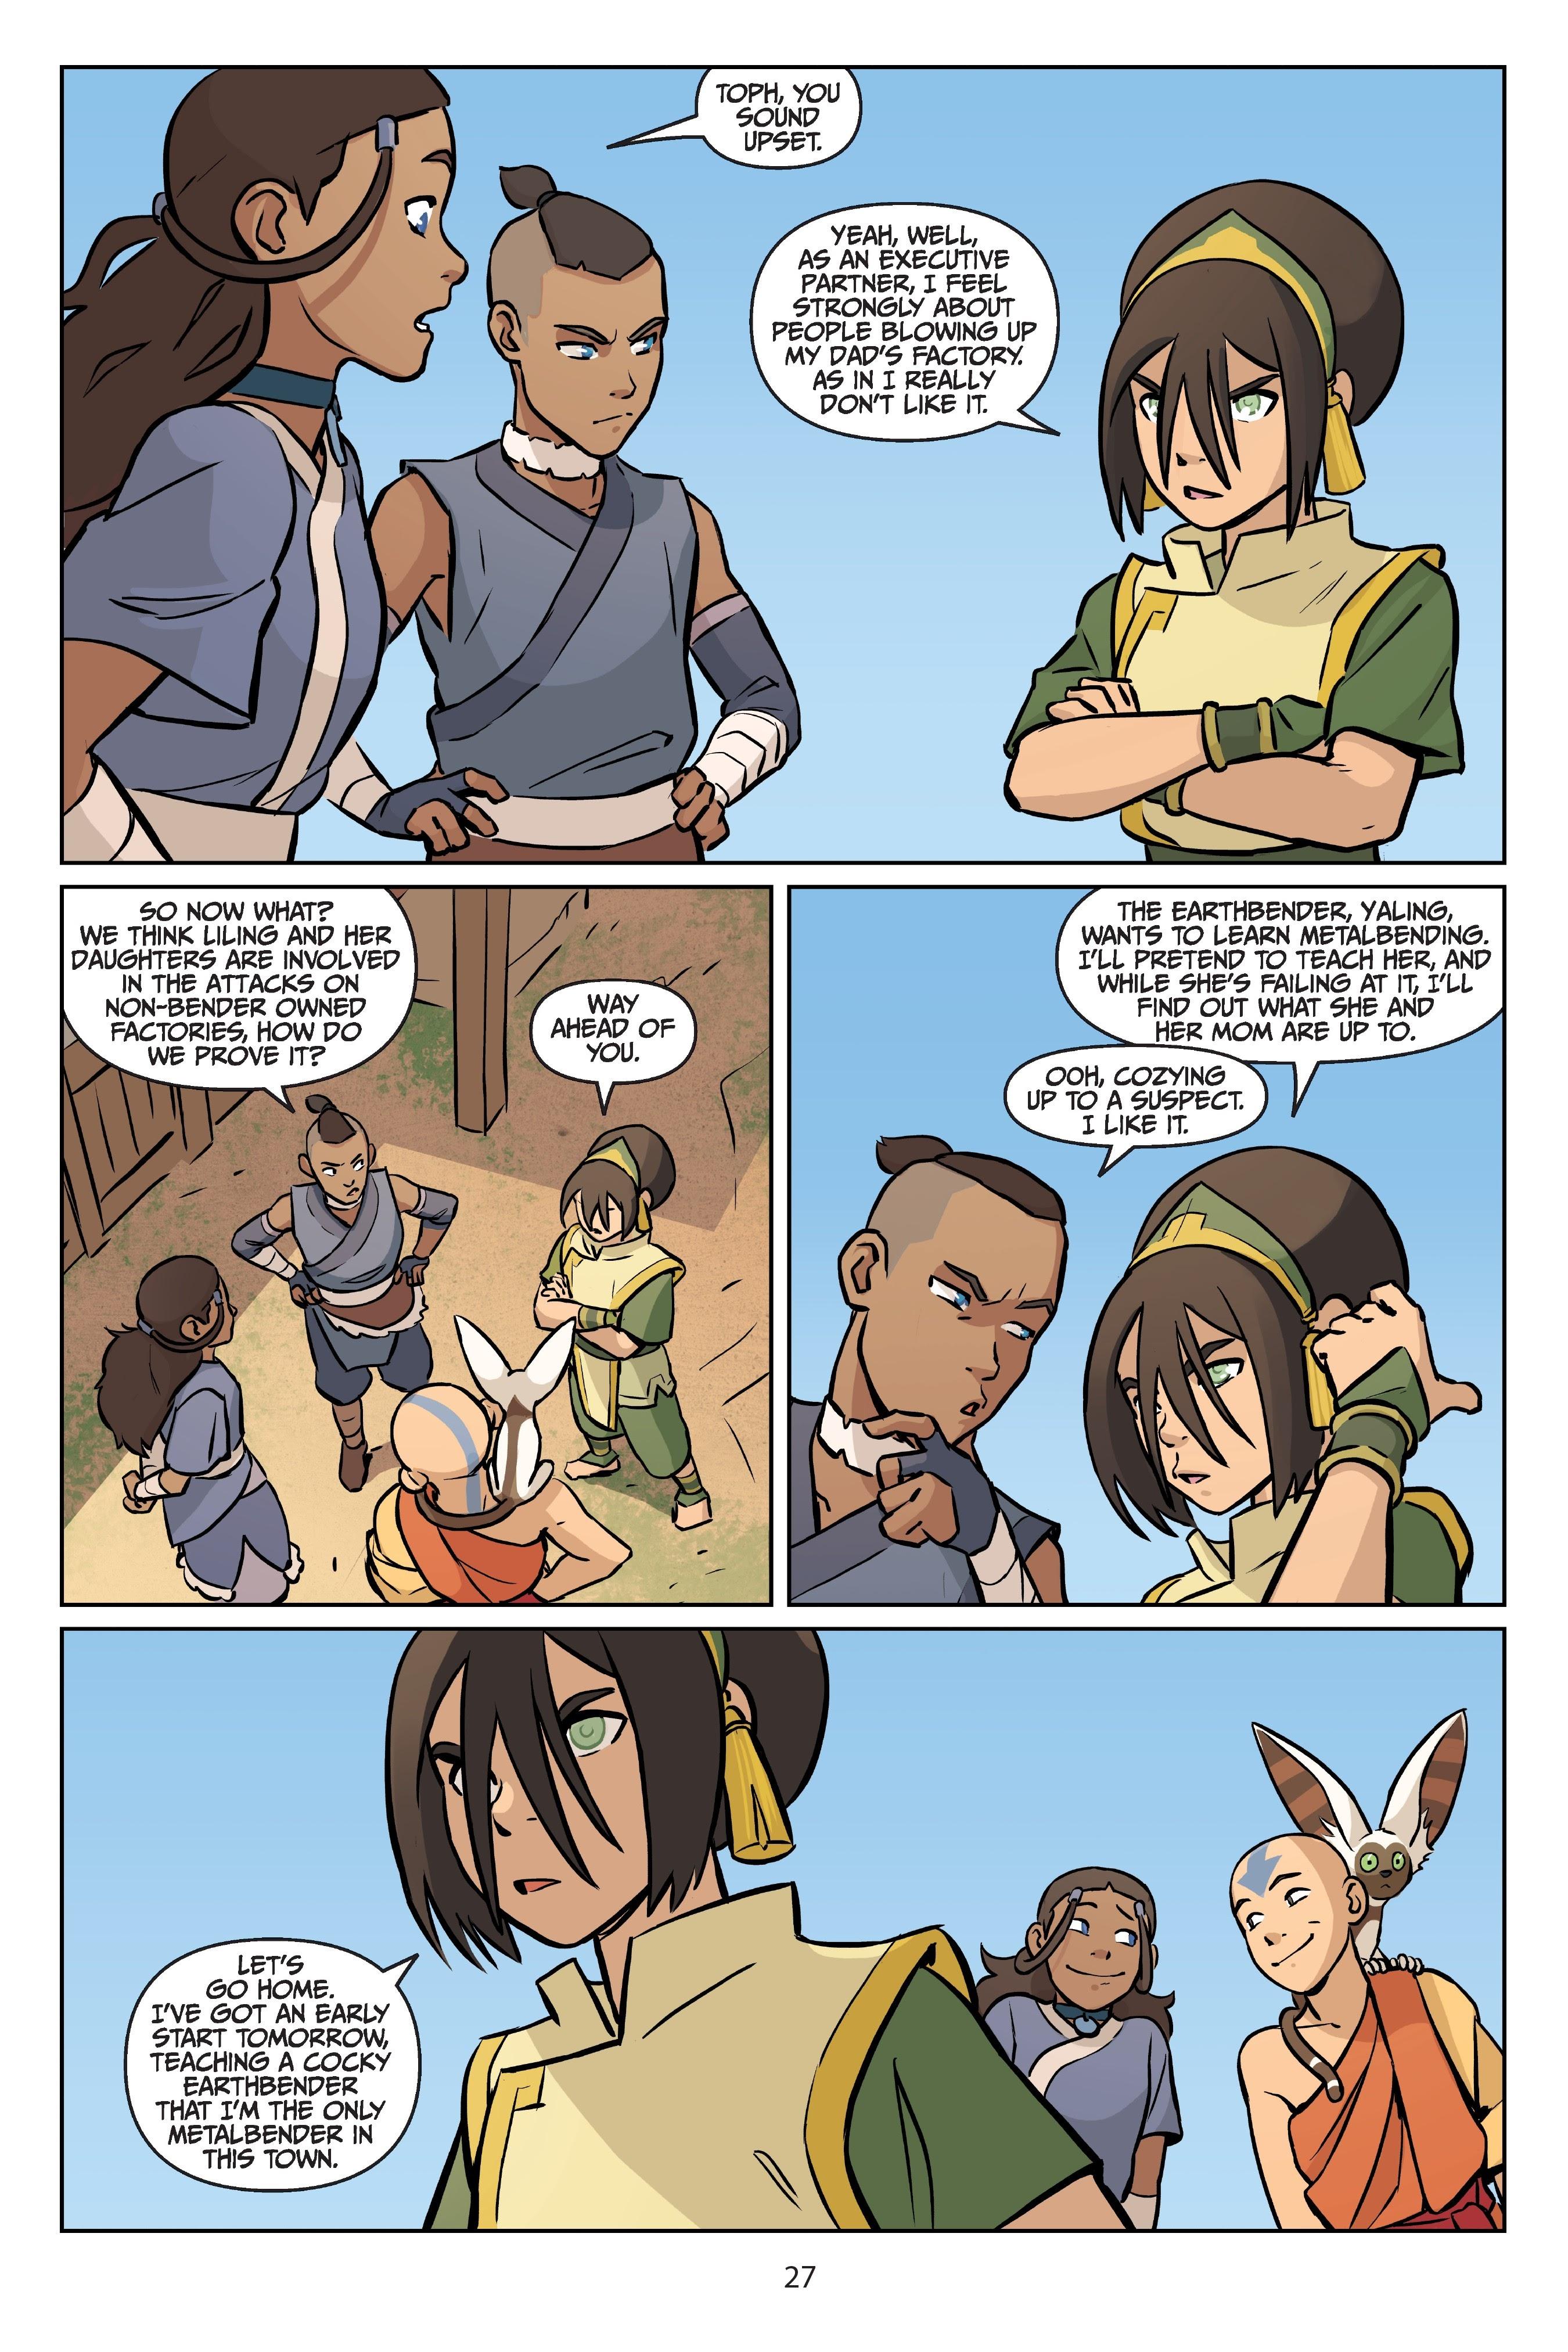 Nickelodeon Avatar: The Last Airbender - Imbalance TPB_2 Page 27